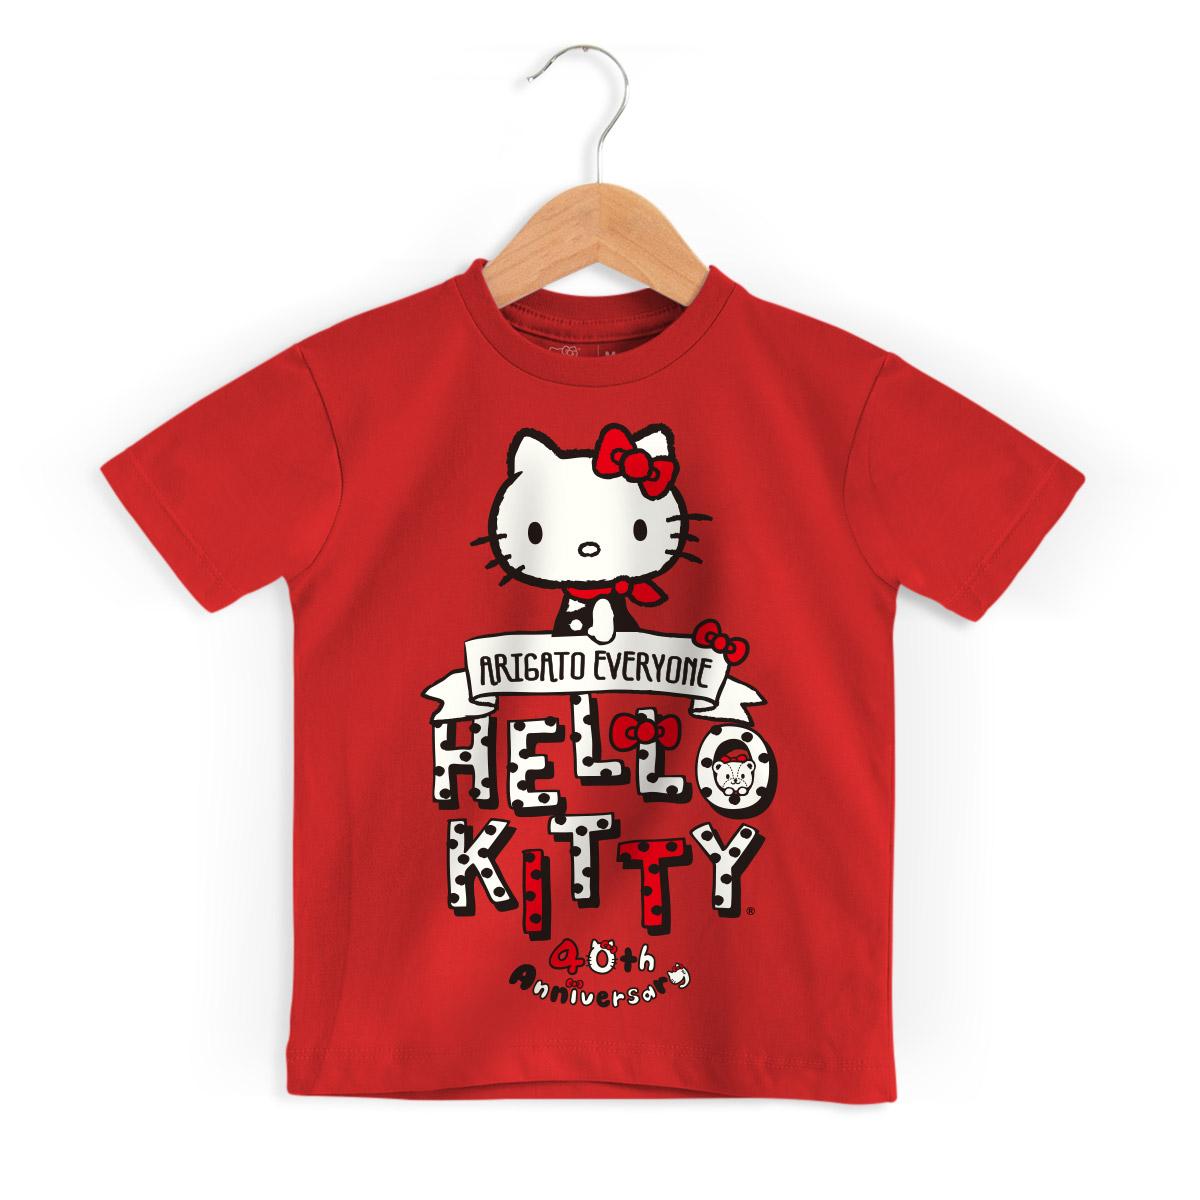 Camiseta Infantil Hello Kitty Arigato Everyone 2